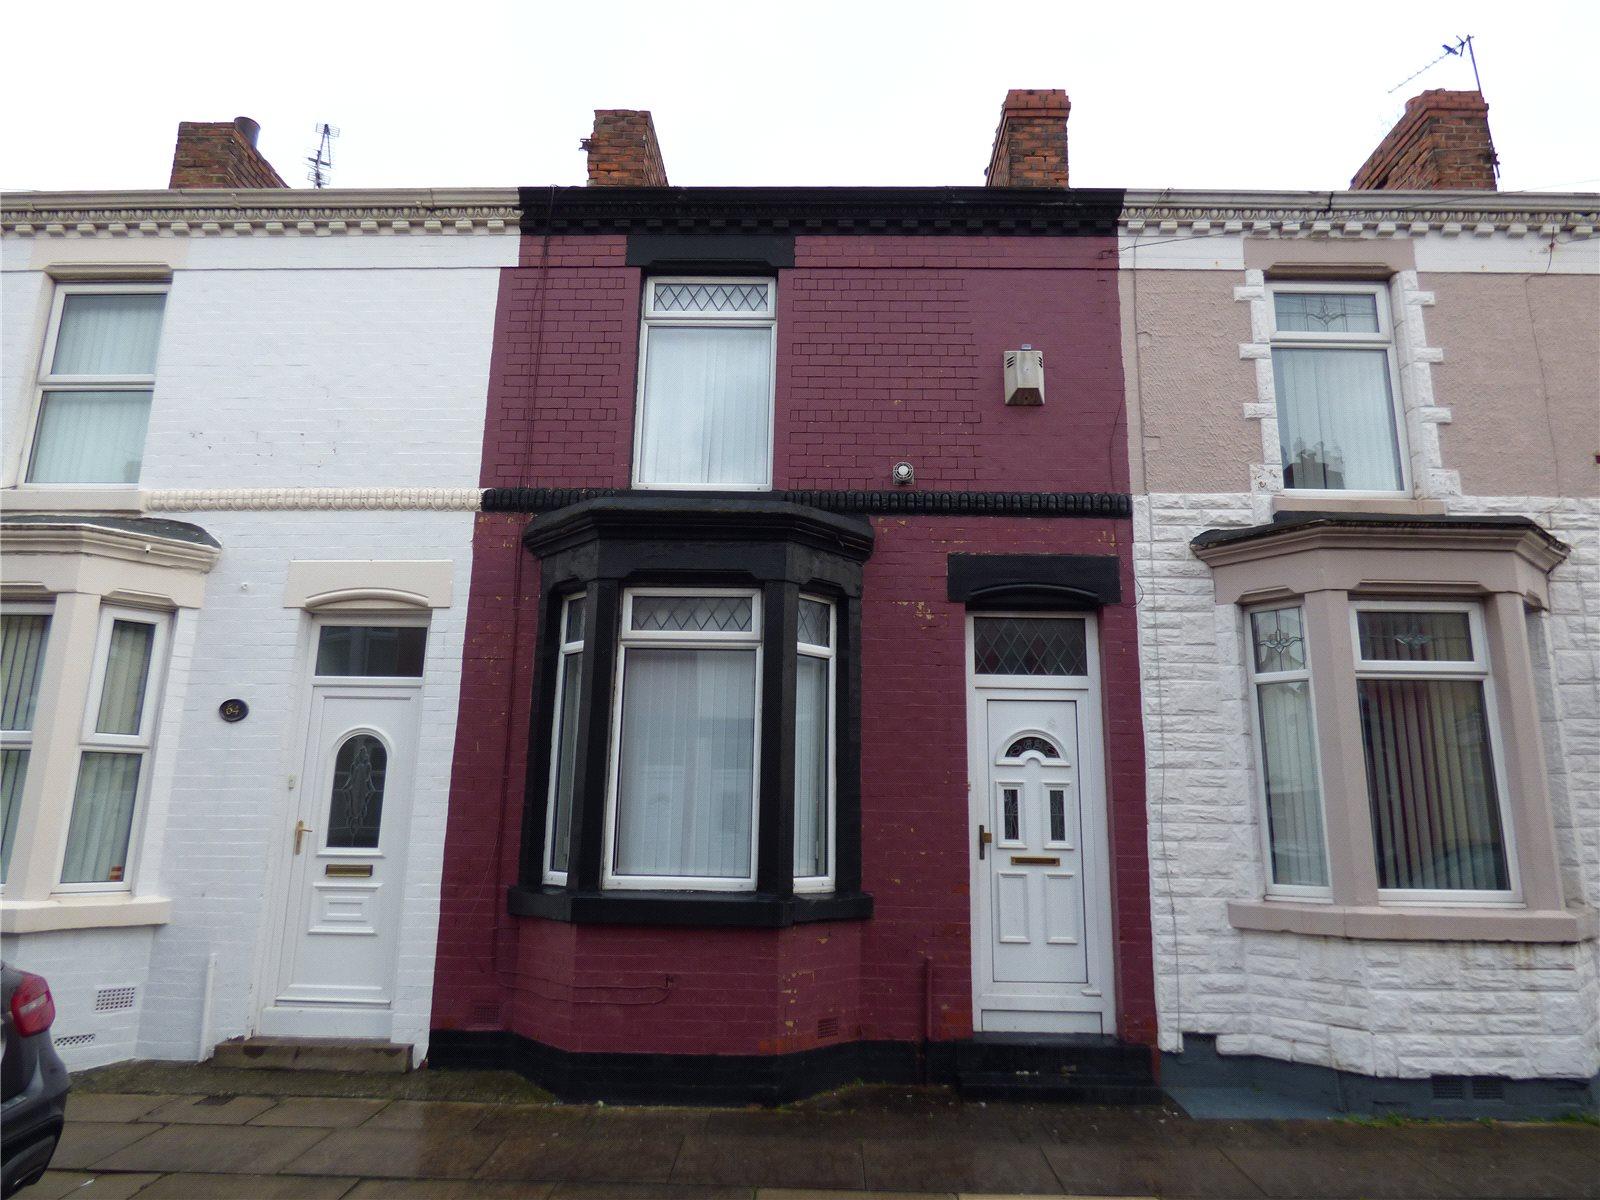 2 Bedrooms Terraced House for sale in Sunbeam Road, Liverpool, Merseyside, L13